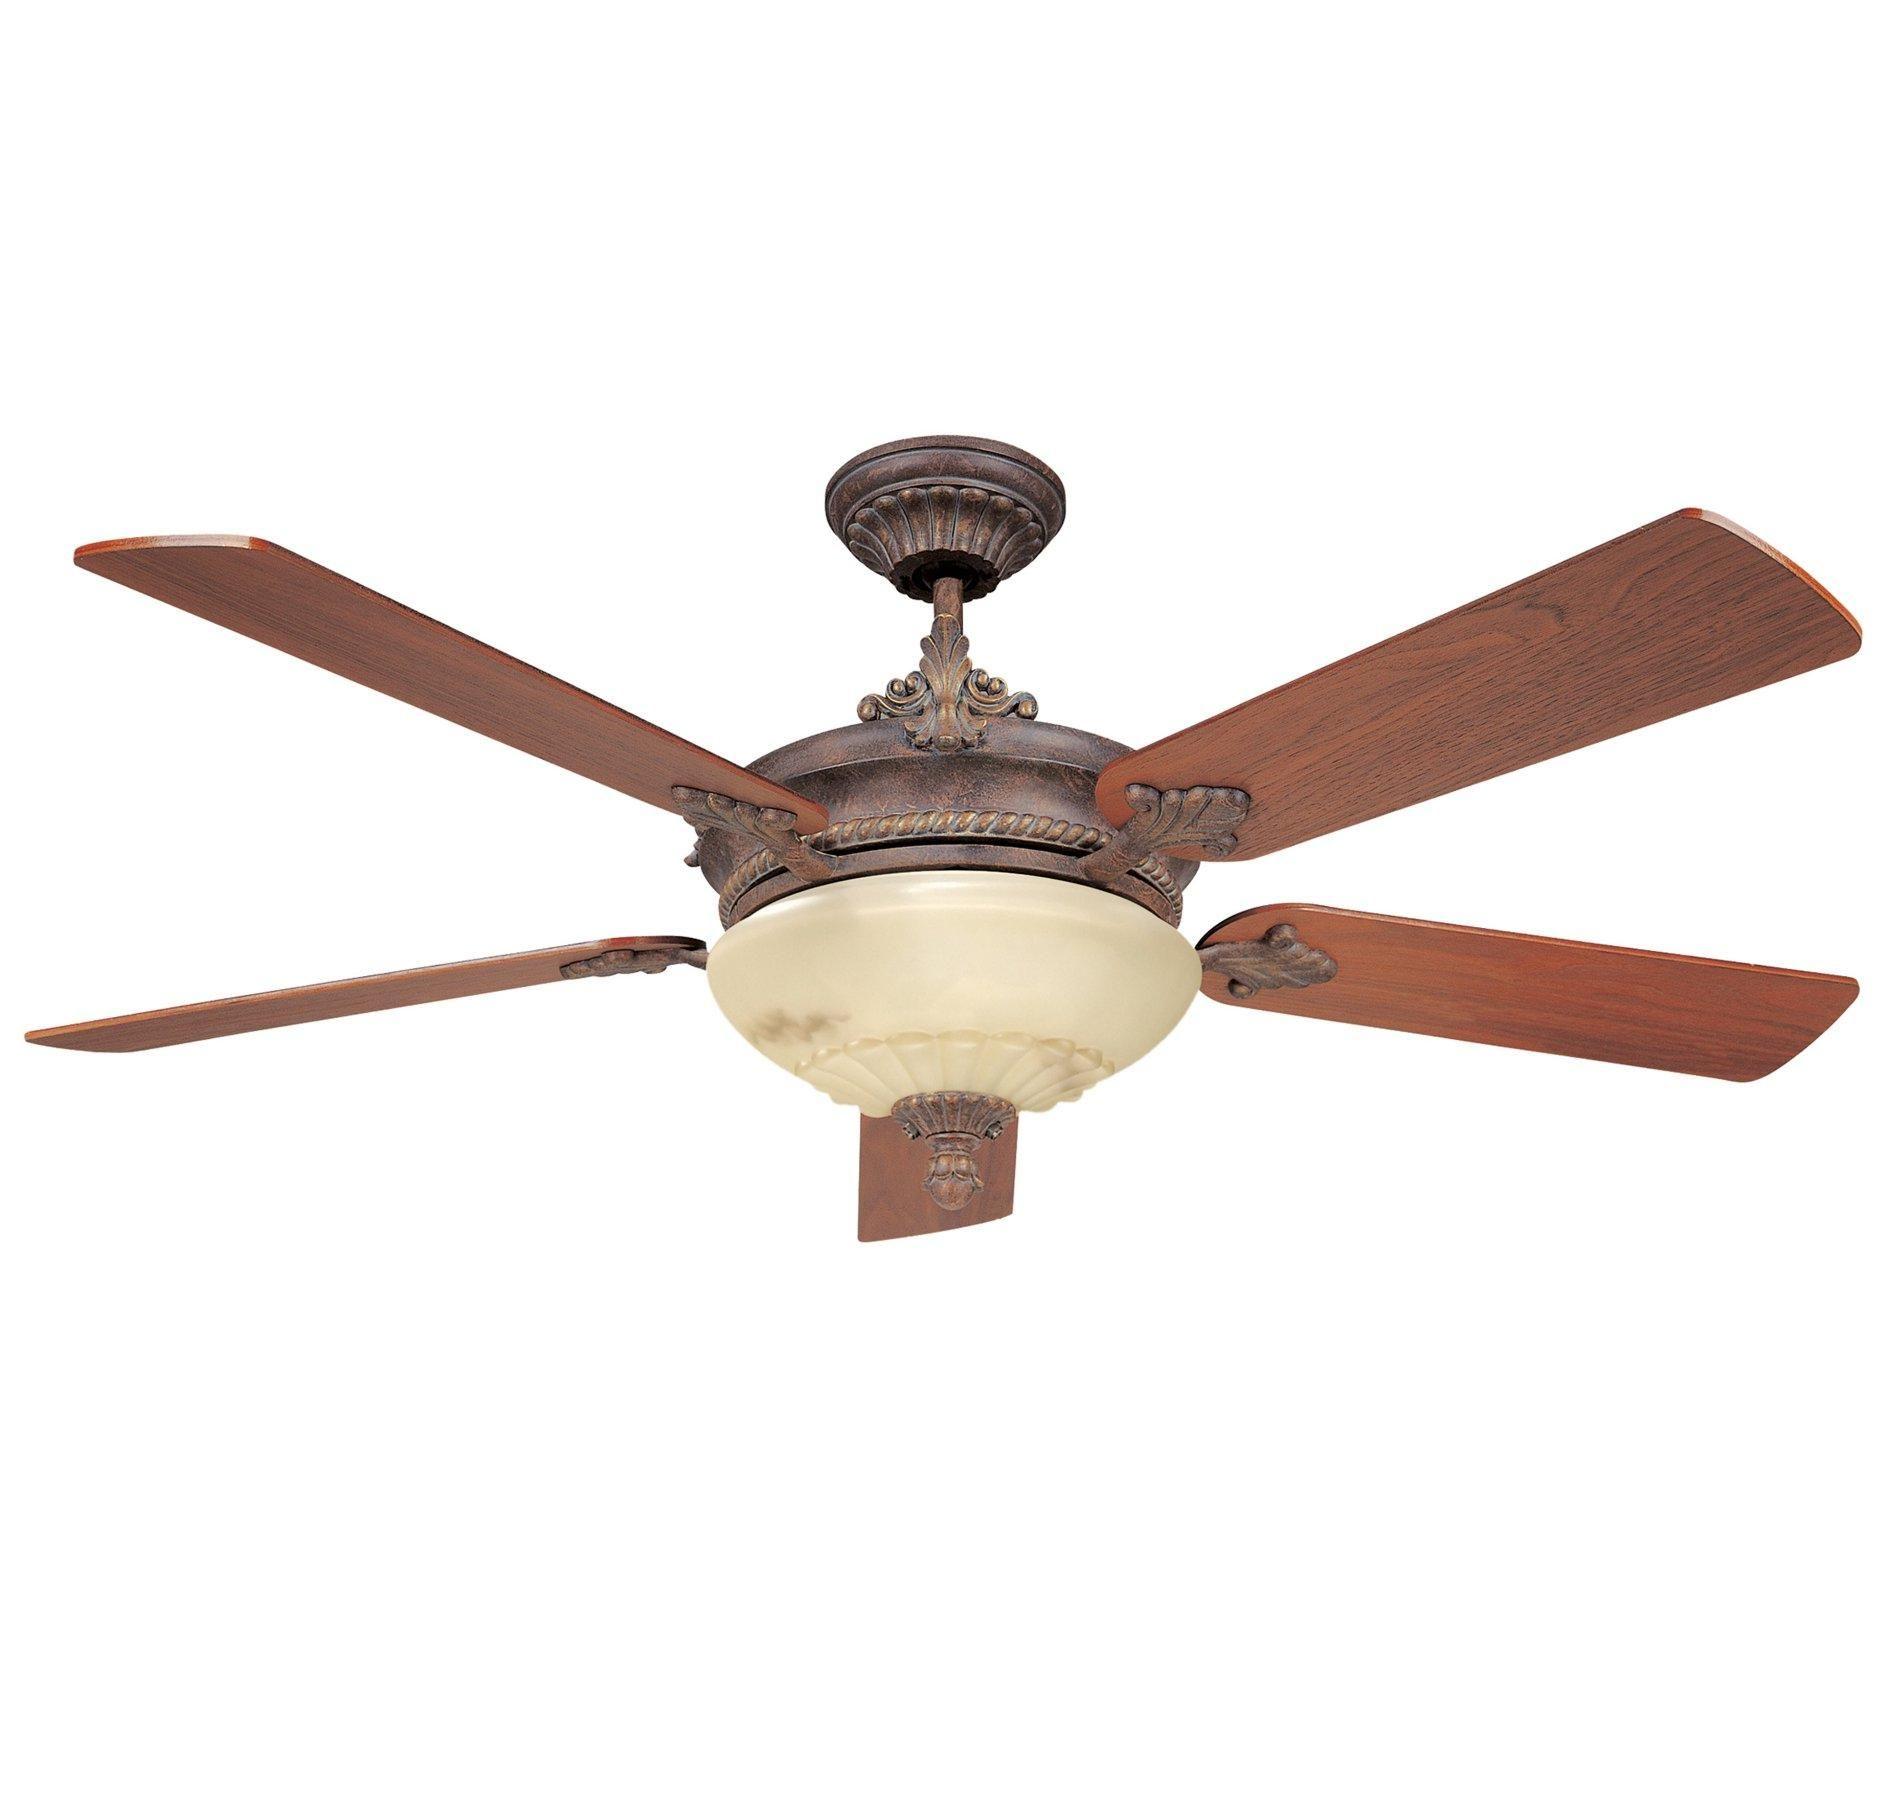 Savoy House Bristol Sv 52 15 5wa Ag Airflow Rating 5339 Cfm Cubic Feet Per Minute Ceiling Fan Gold Ceiling Fan Victorian Ceiling Fans